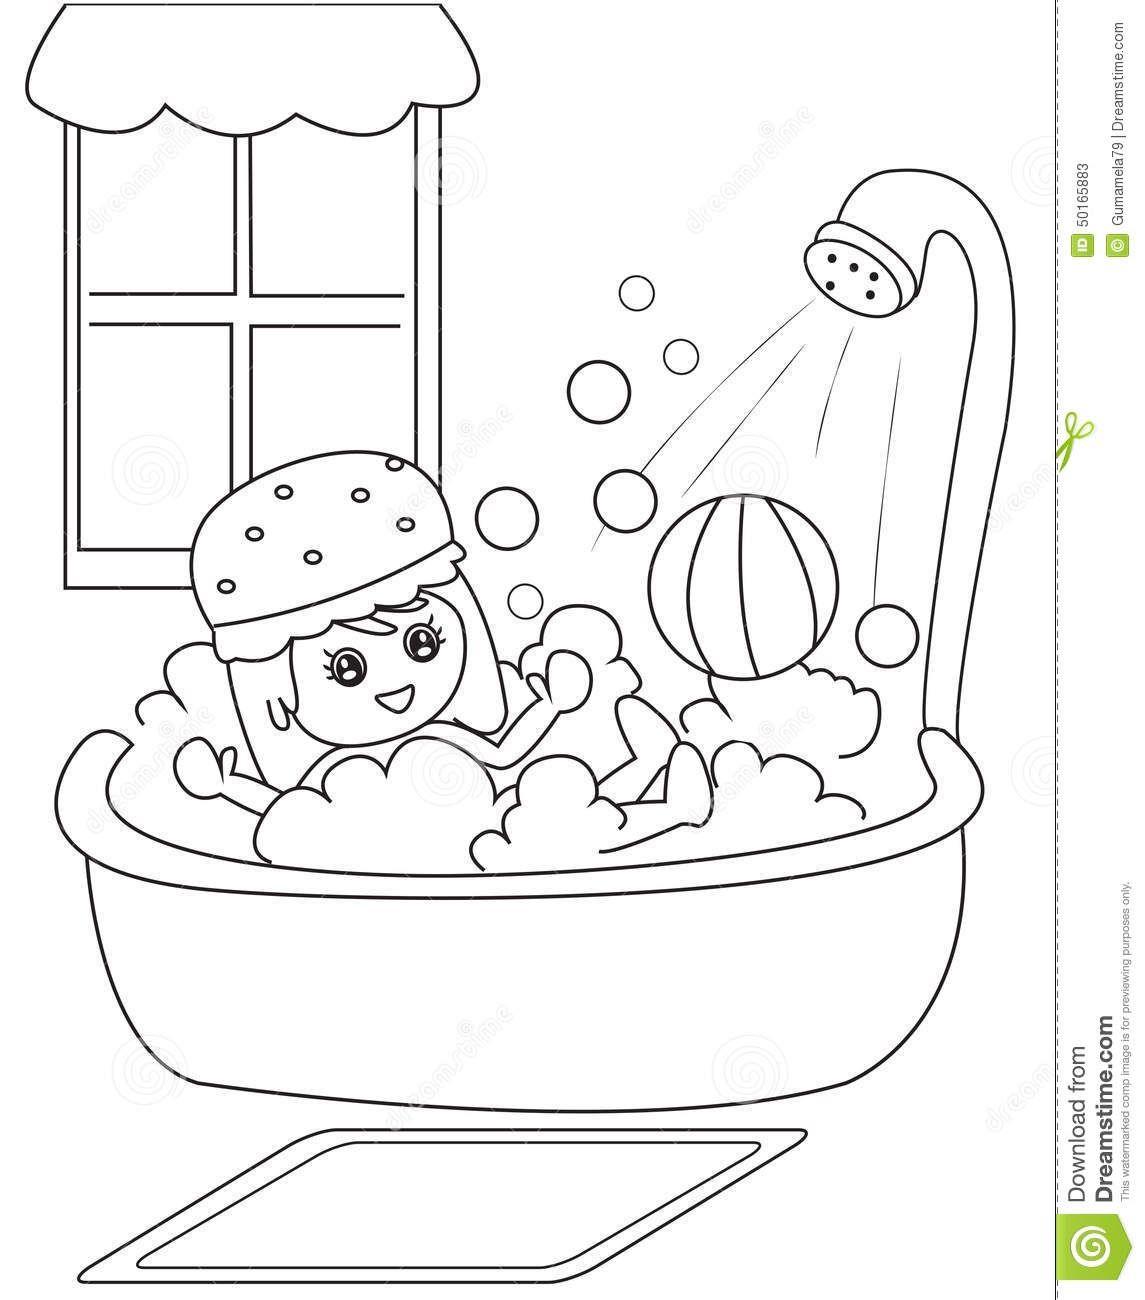 Bathroom Clip Art Black And White: Bathtub Clipart Black And White, Bathtub Black And White